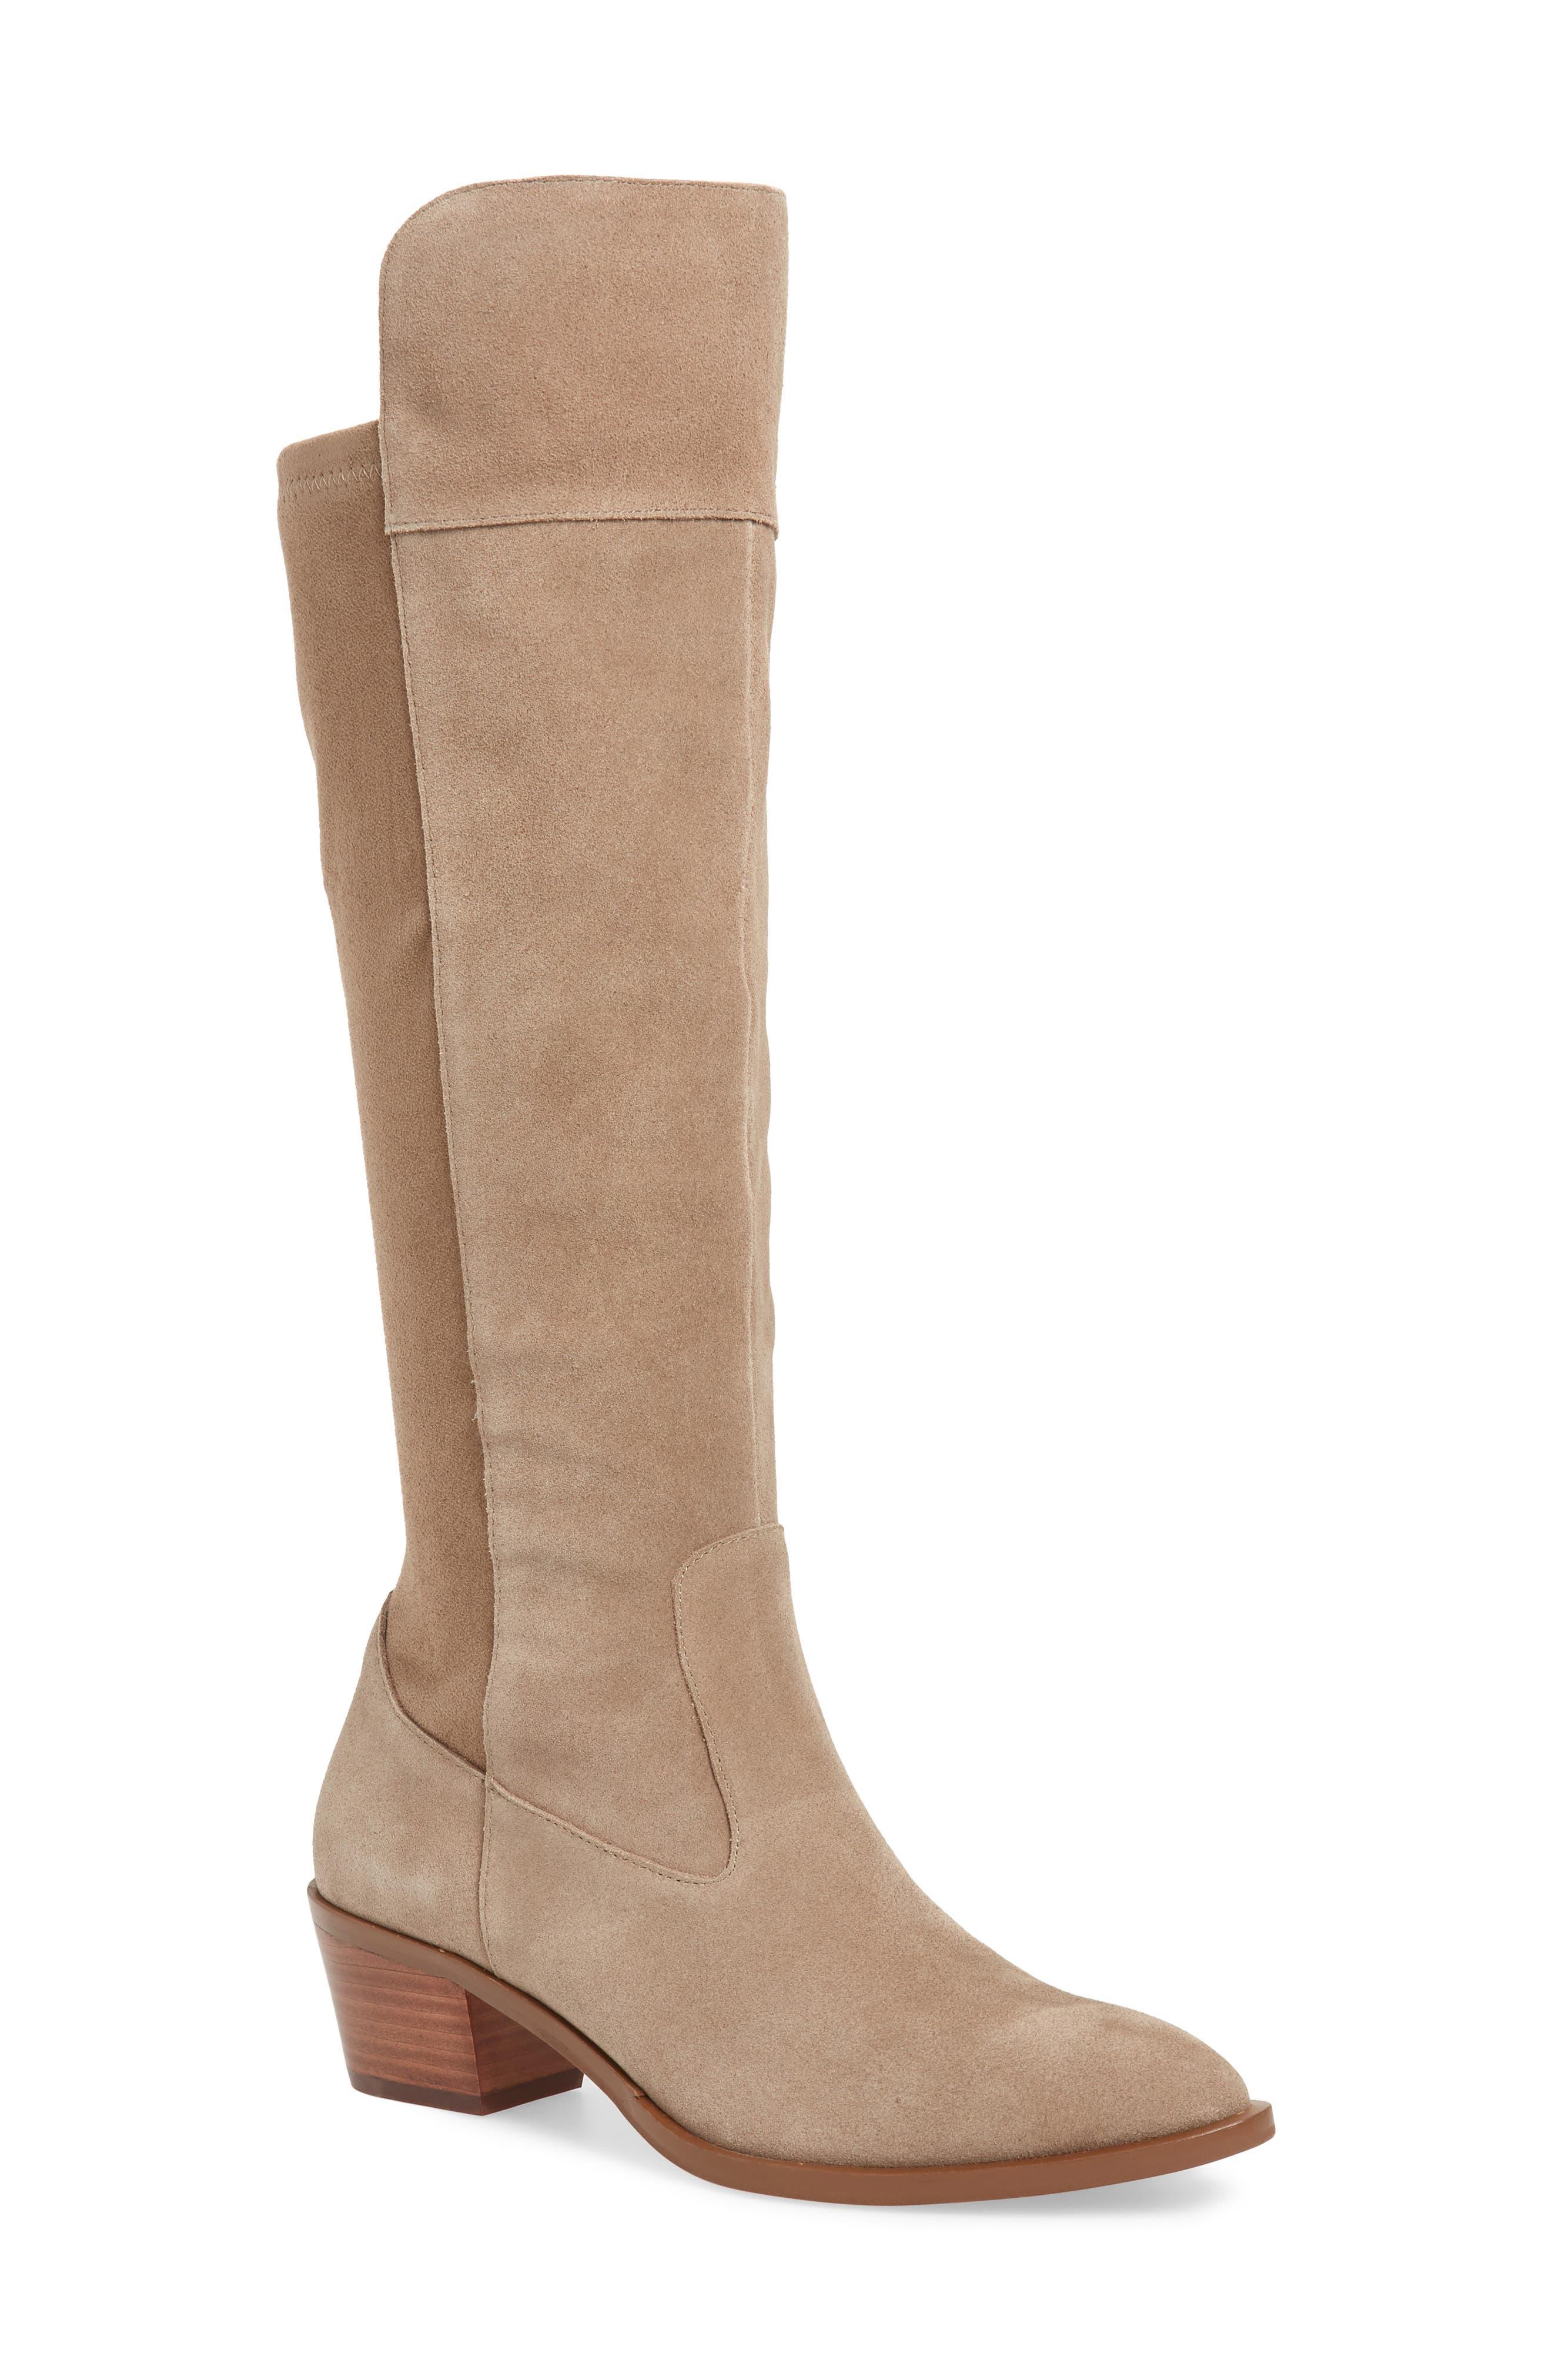 Sole Society Noamie Knee High Boot- Beige